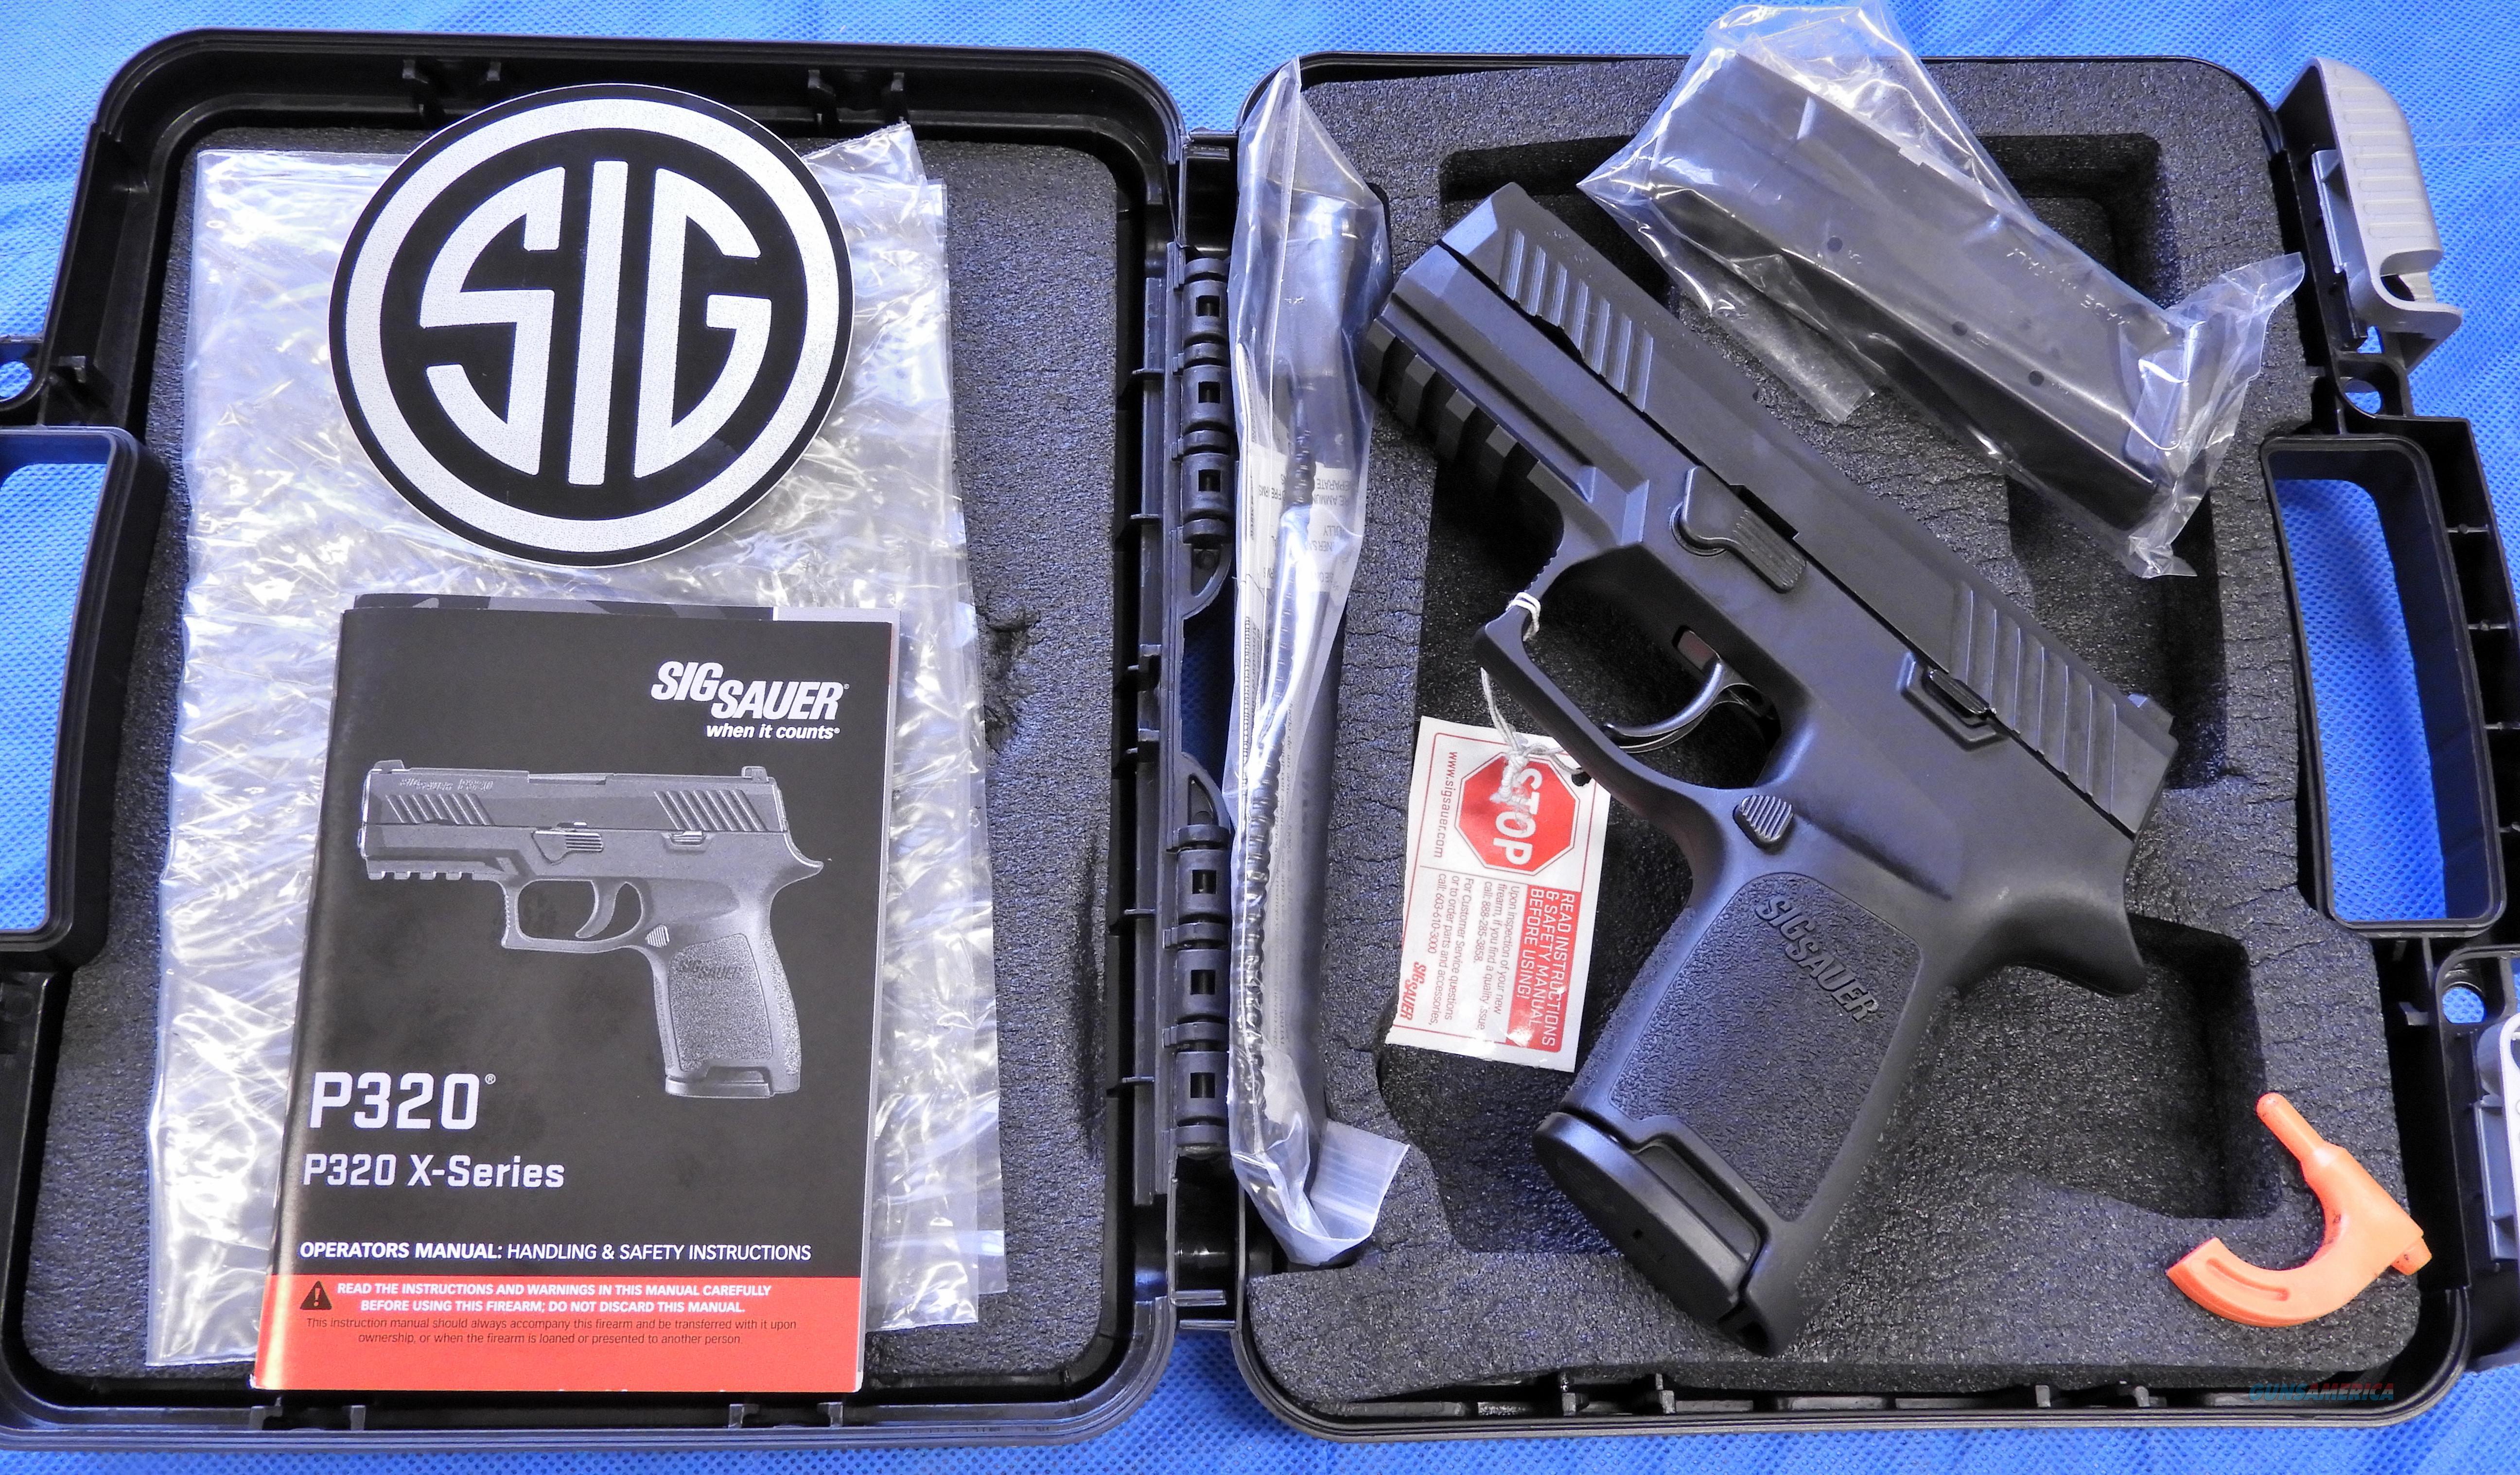 SIG Sauer P320 Compact .357 SIG Factory New Dealer Stock NIB Night Sights 2 Mags SIG Uncataloged Special  Guns > Pistols > Sig - Sauer/Sigarms Pistols > P320